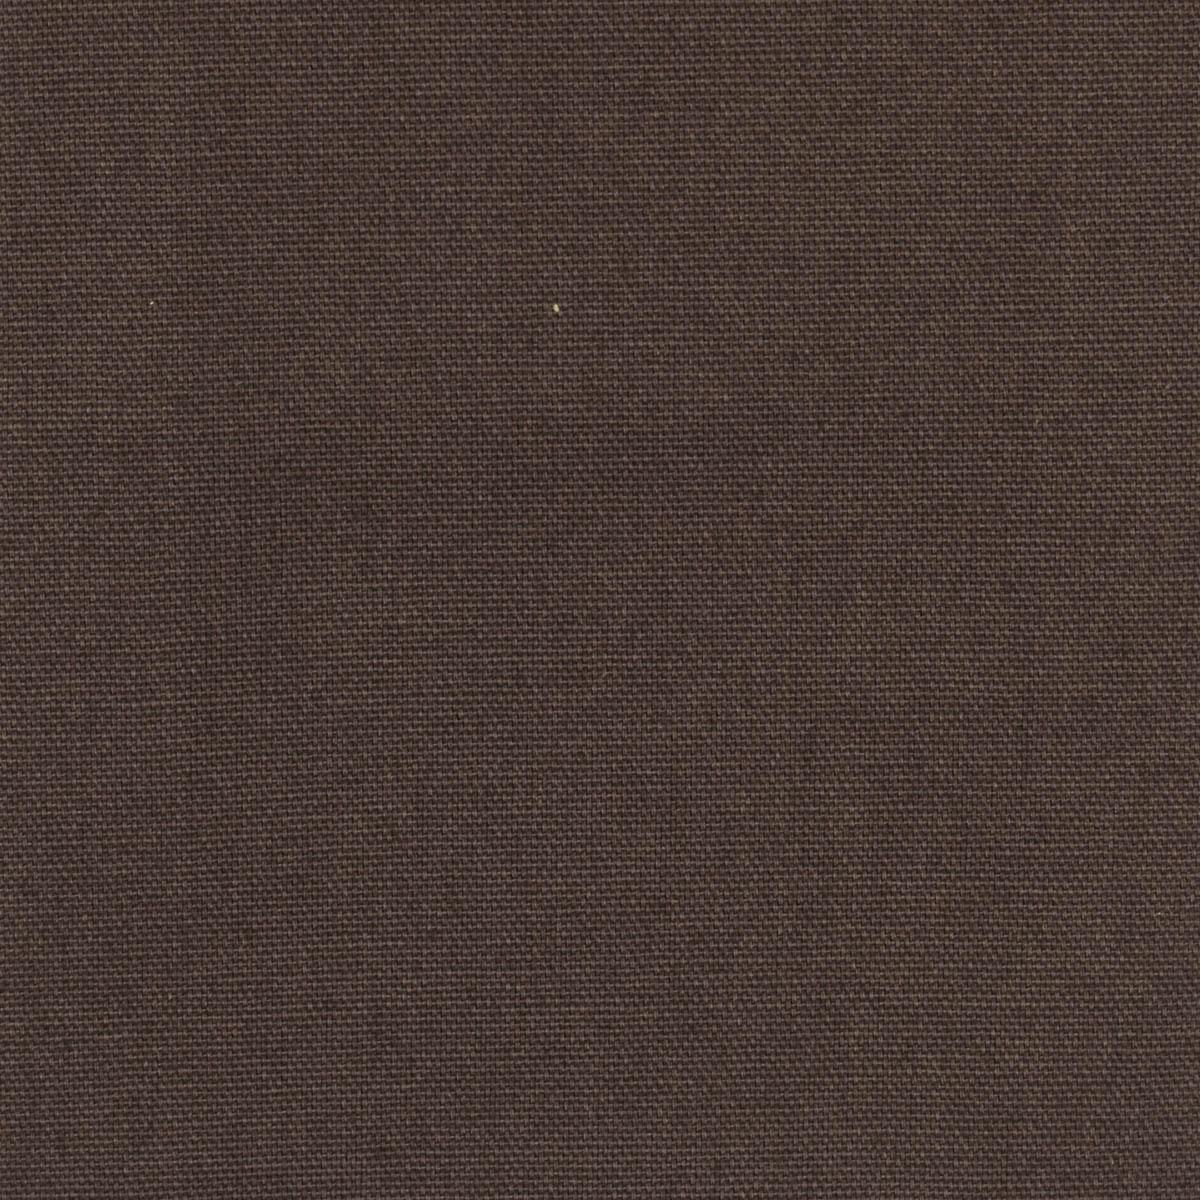 Fine Brown Curtain Fabric Images - Bathtub for Bathroom Ideas ...